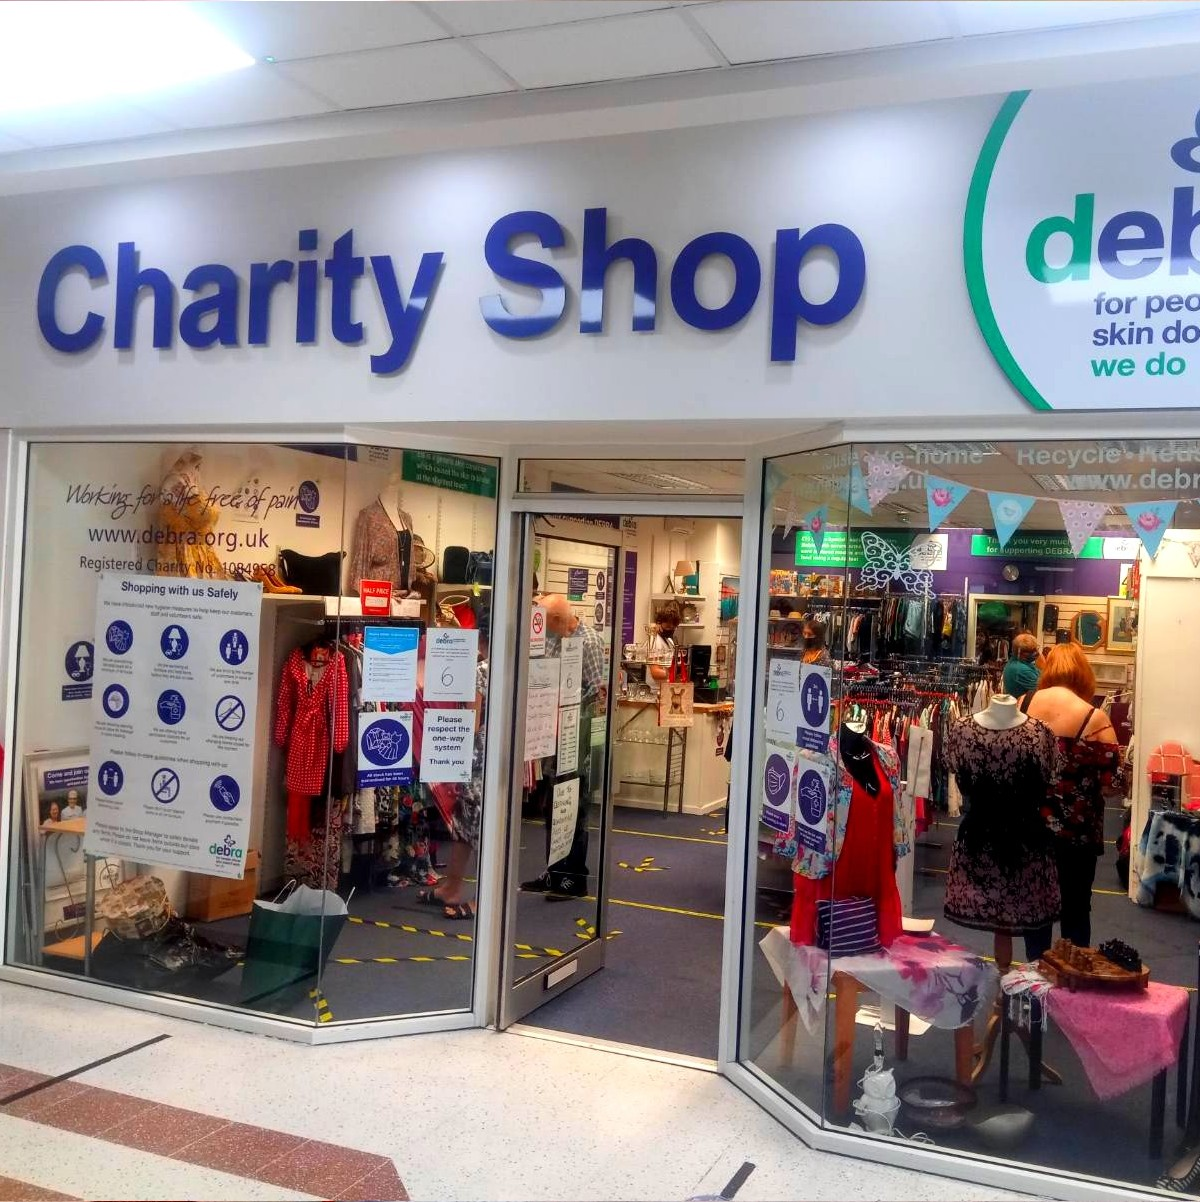 Debra Charity Shop